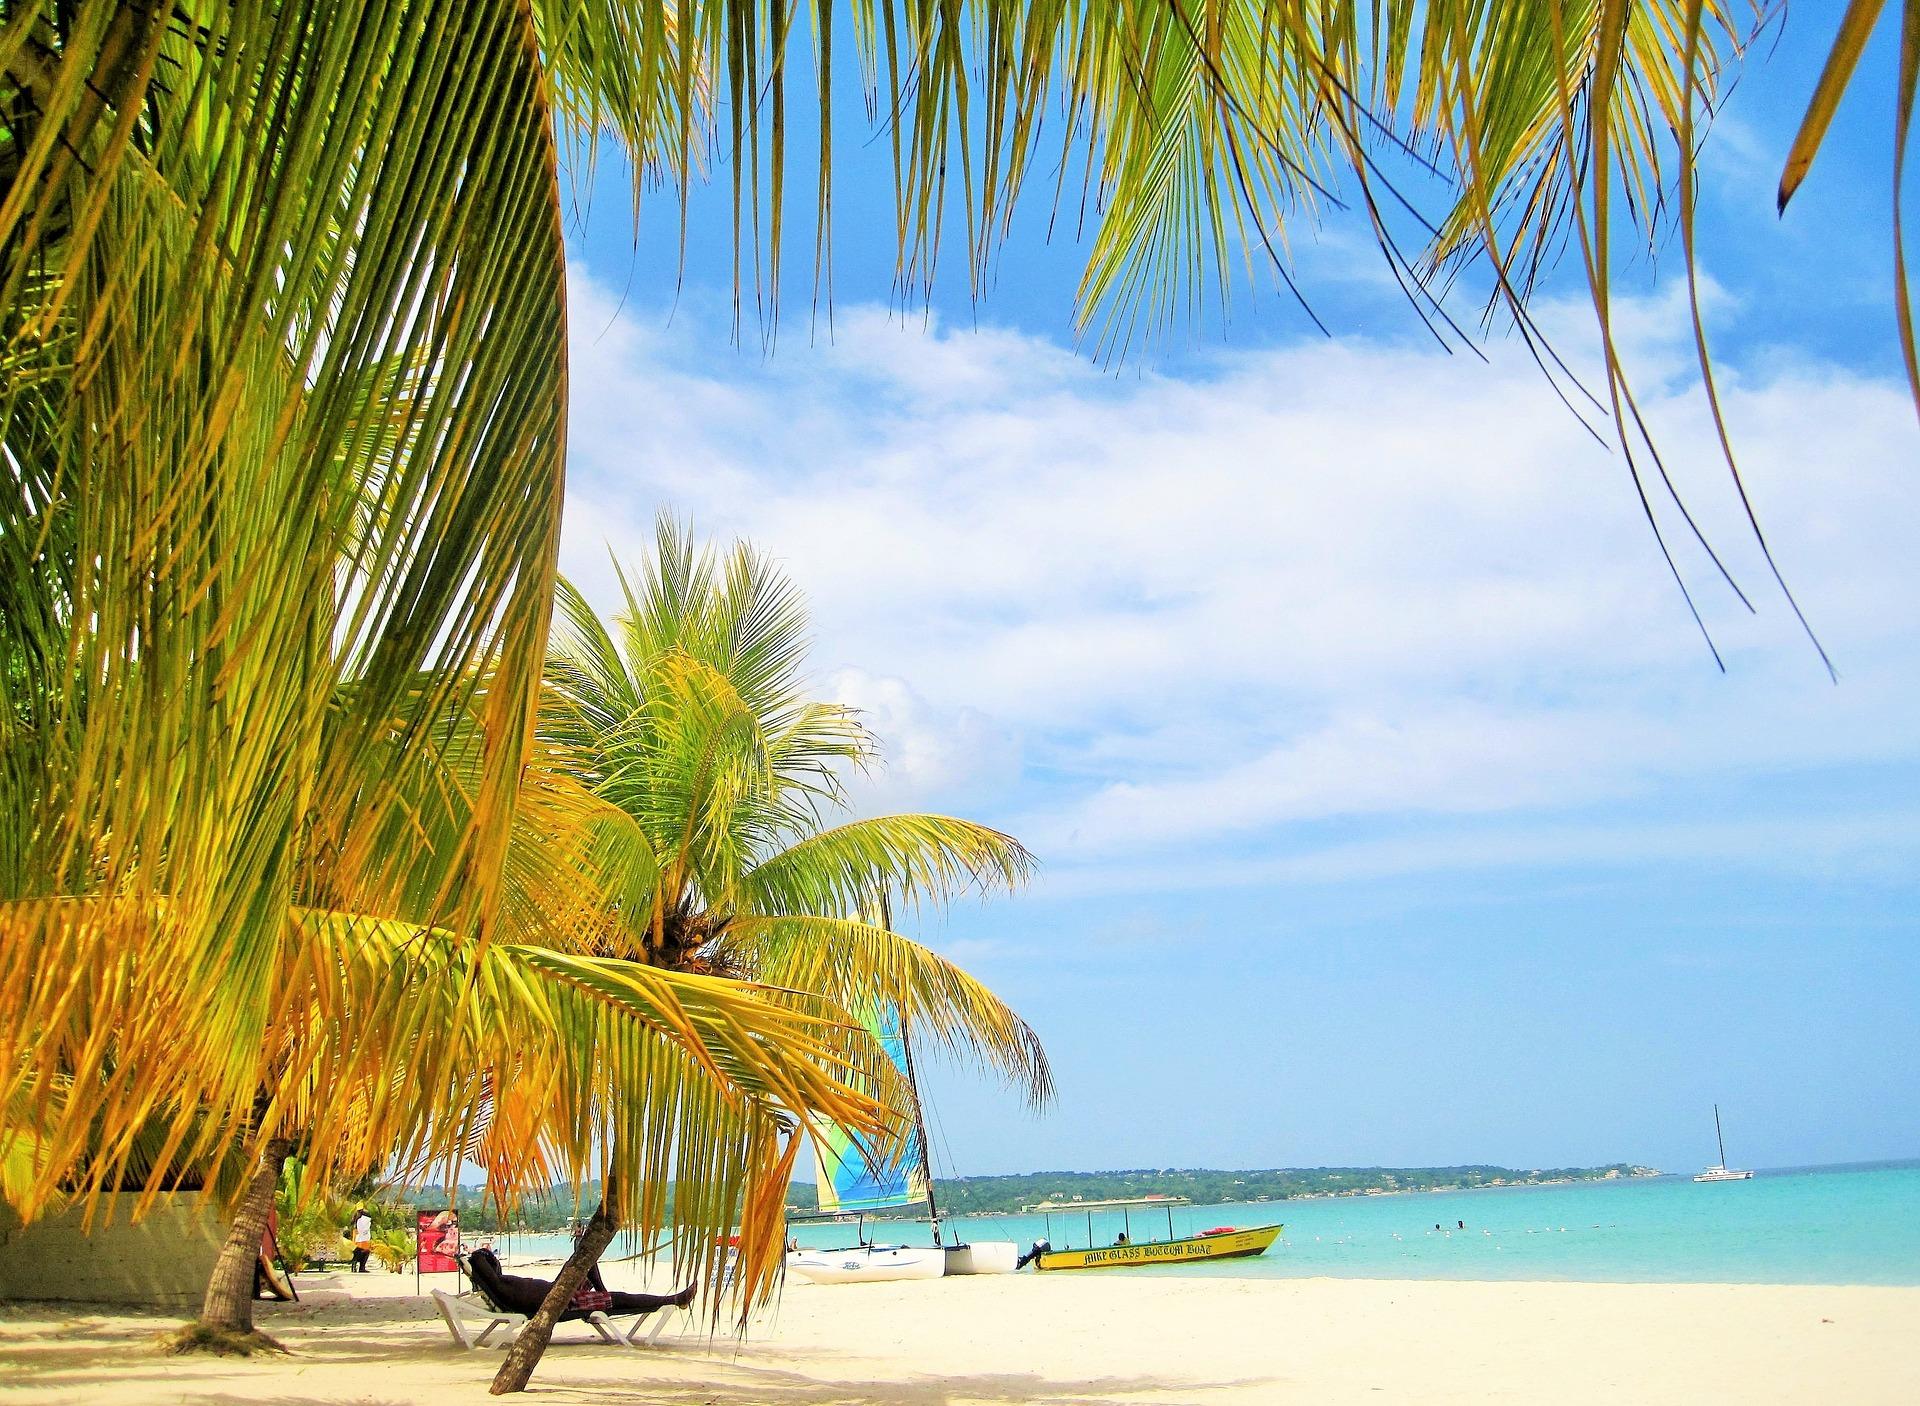 ямайка пляж з пальмами